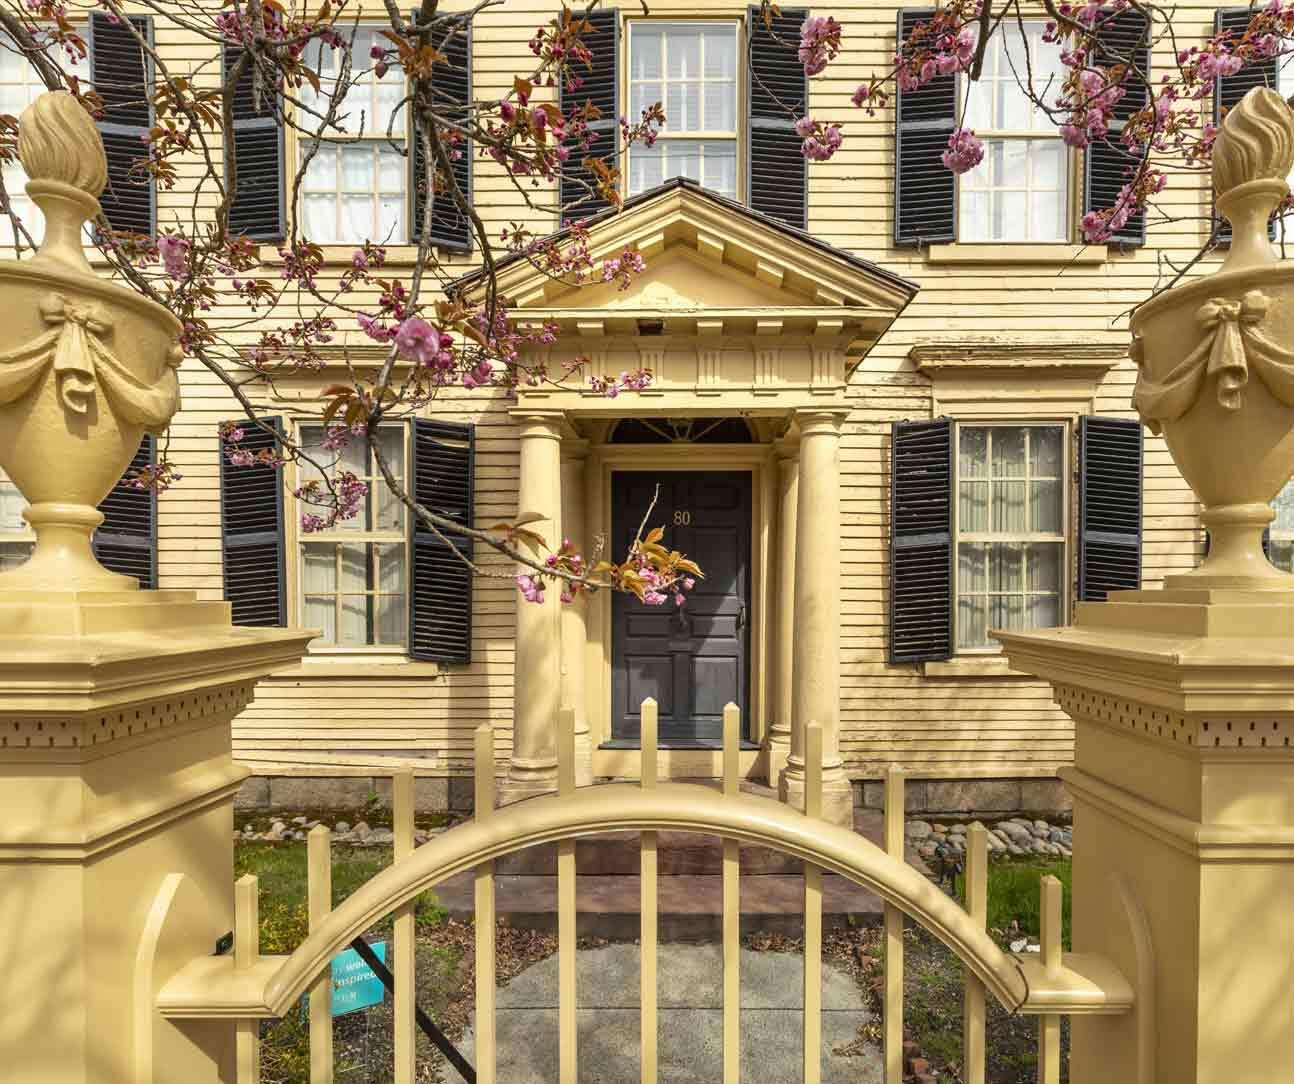 Peirce-Nichols House